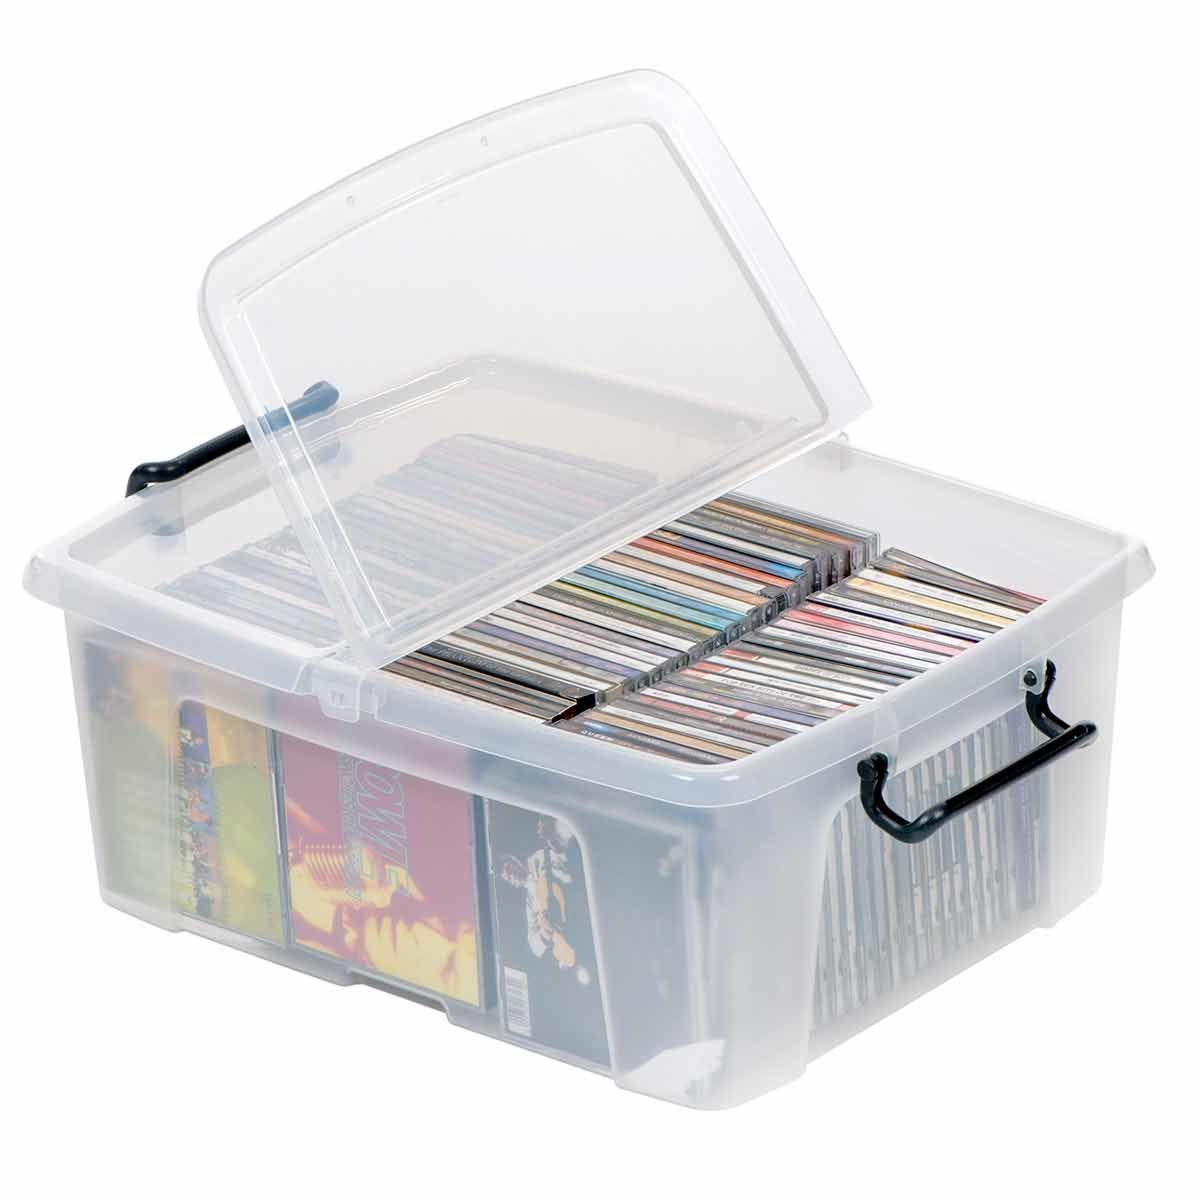 Strata Smart Plastic Storage Box with Folding Lid 24 Litre